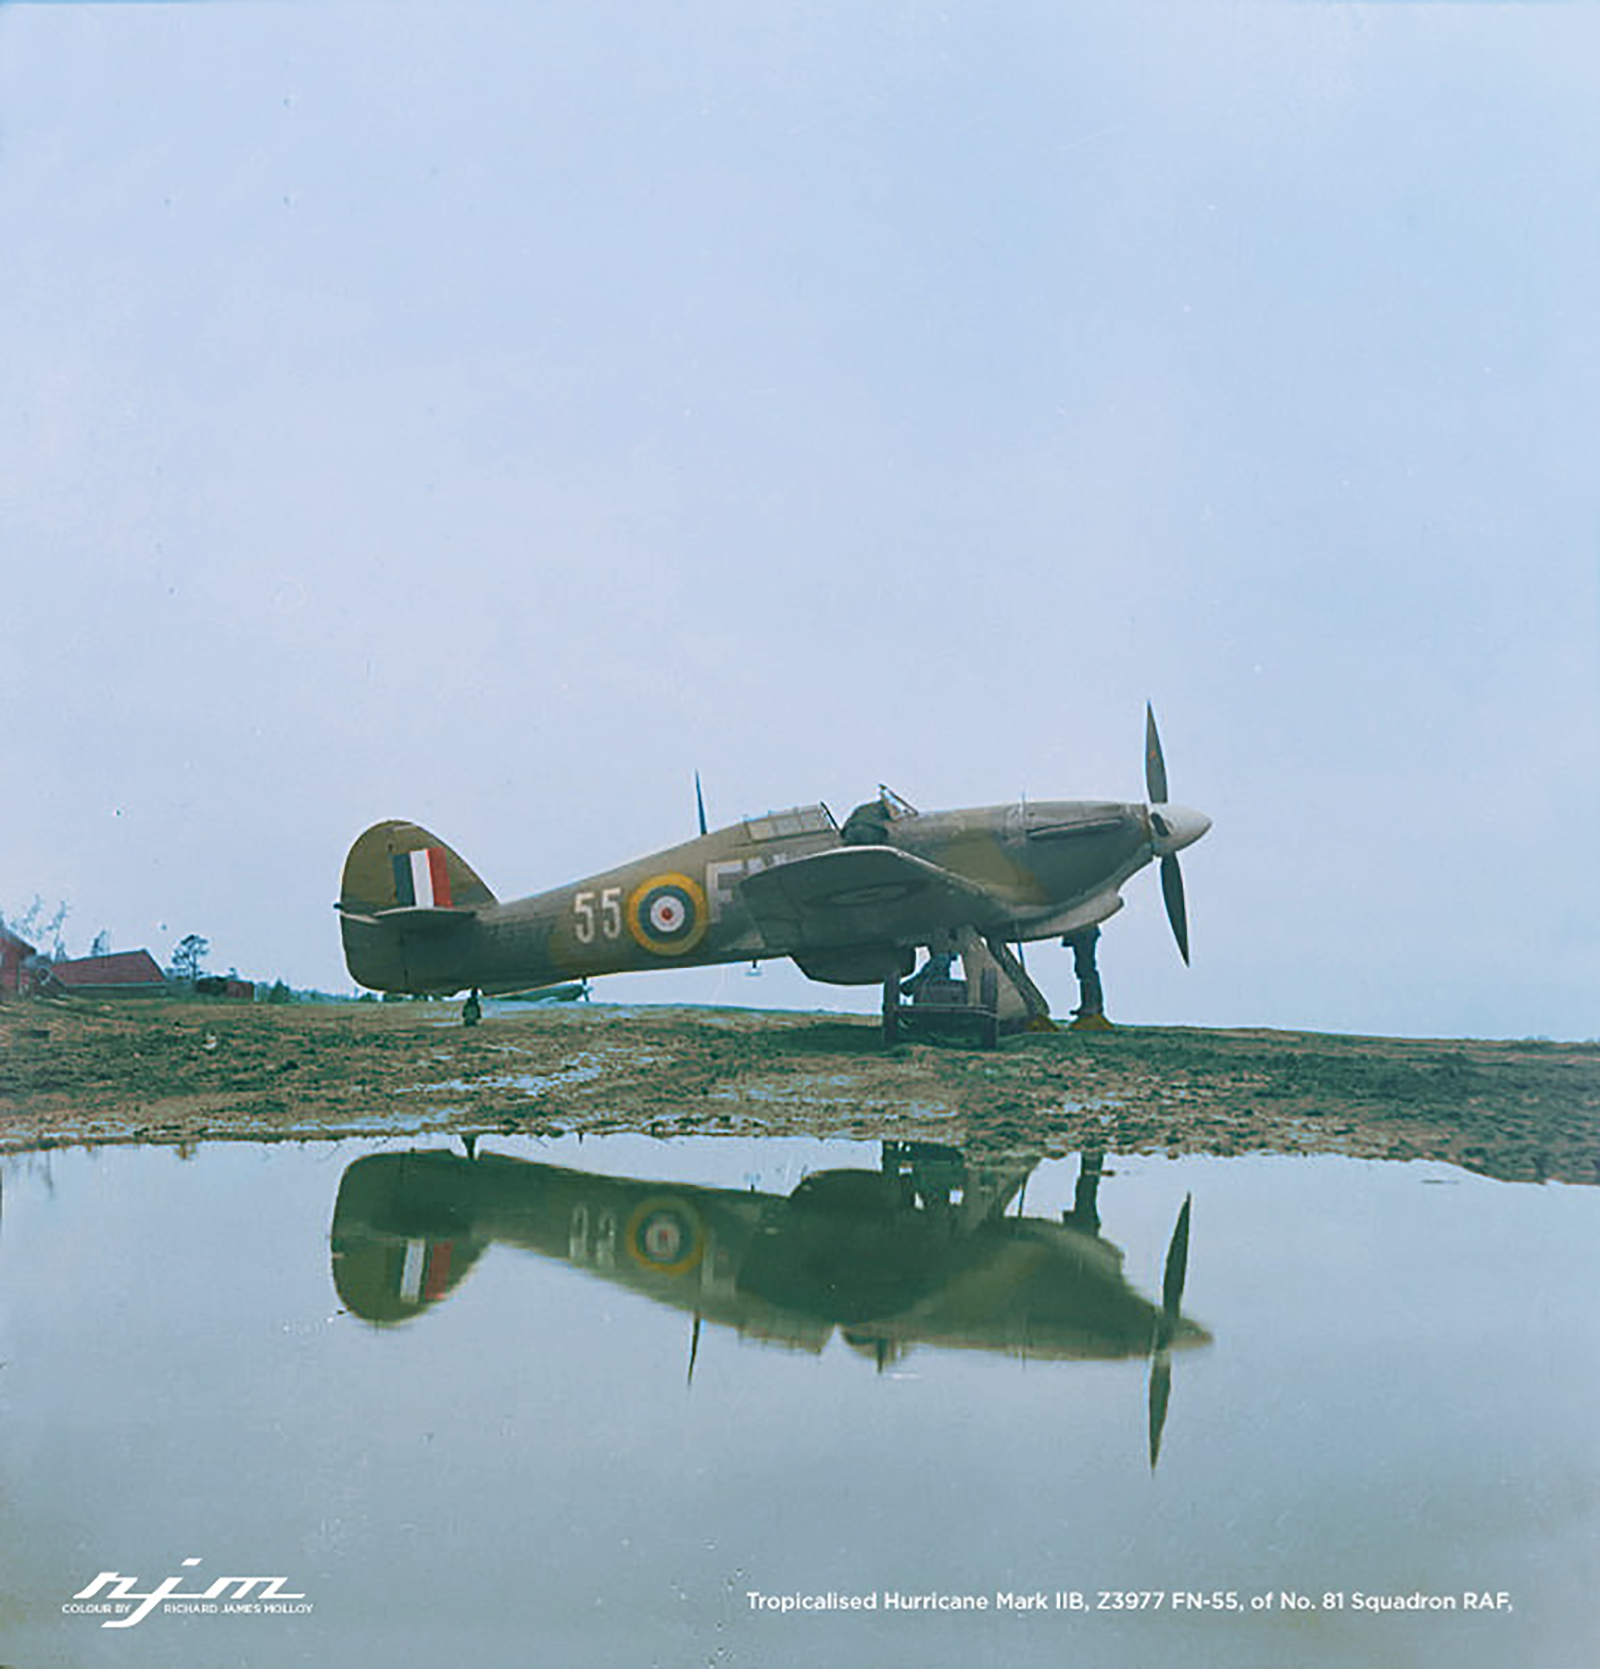 Hurricane IIb Trop RAF 151 Wing 81Sqn FN55 Z3577 Vaenga USSR Oct 1941 01